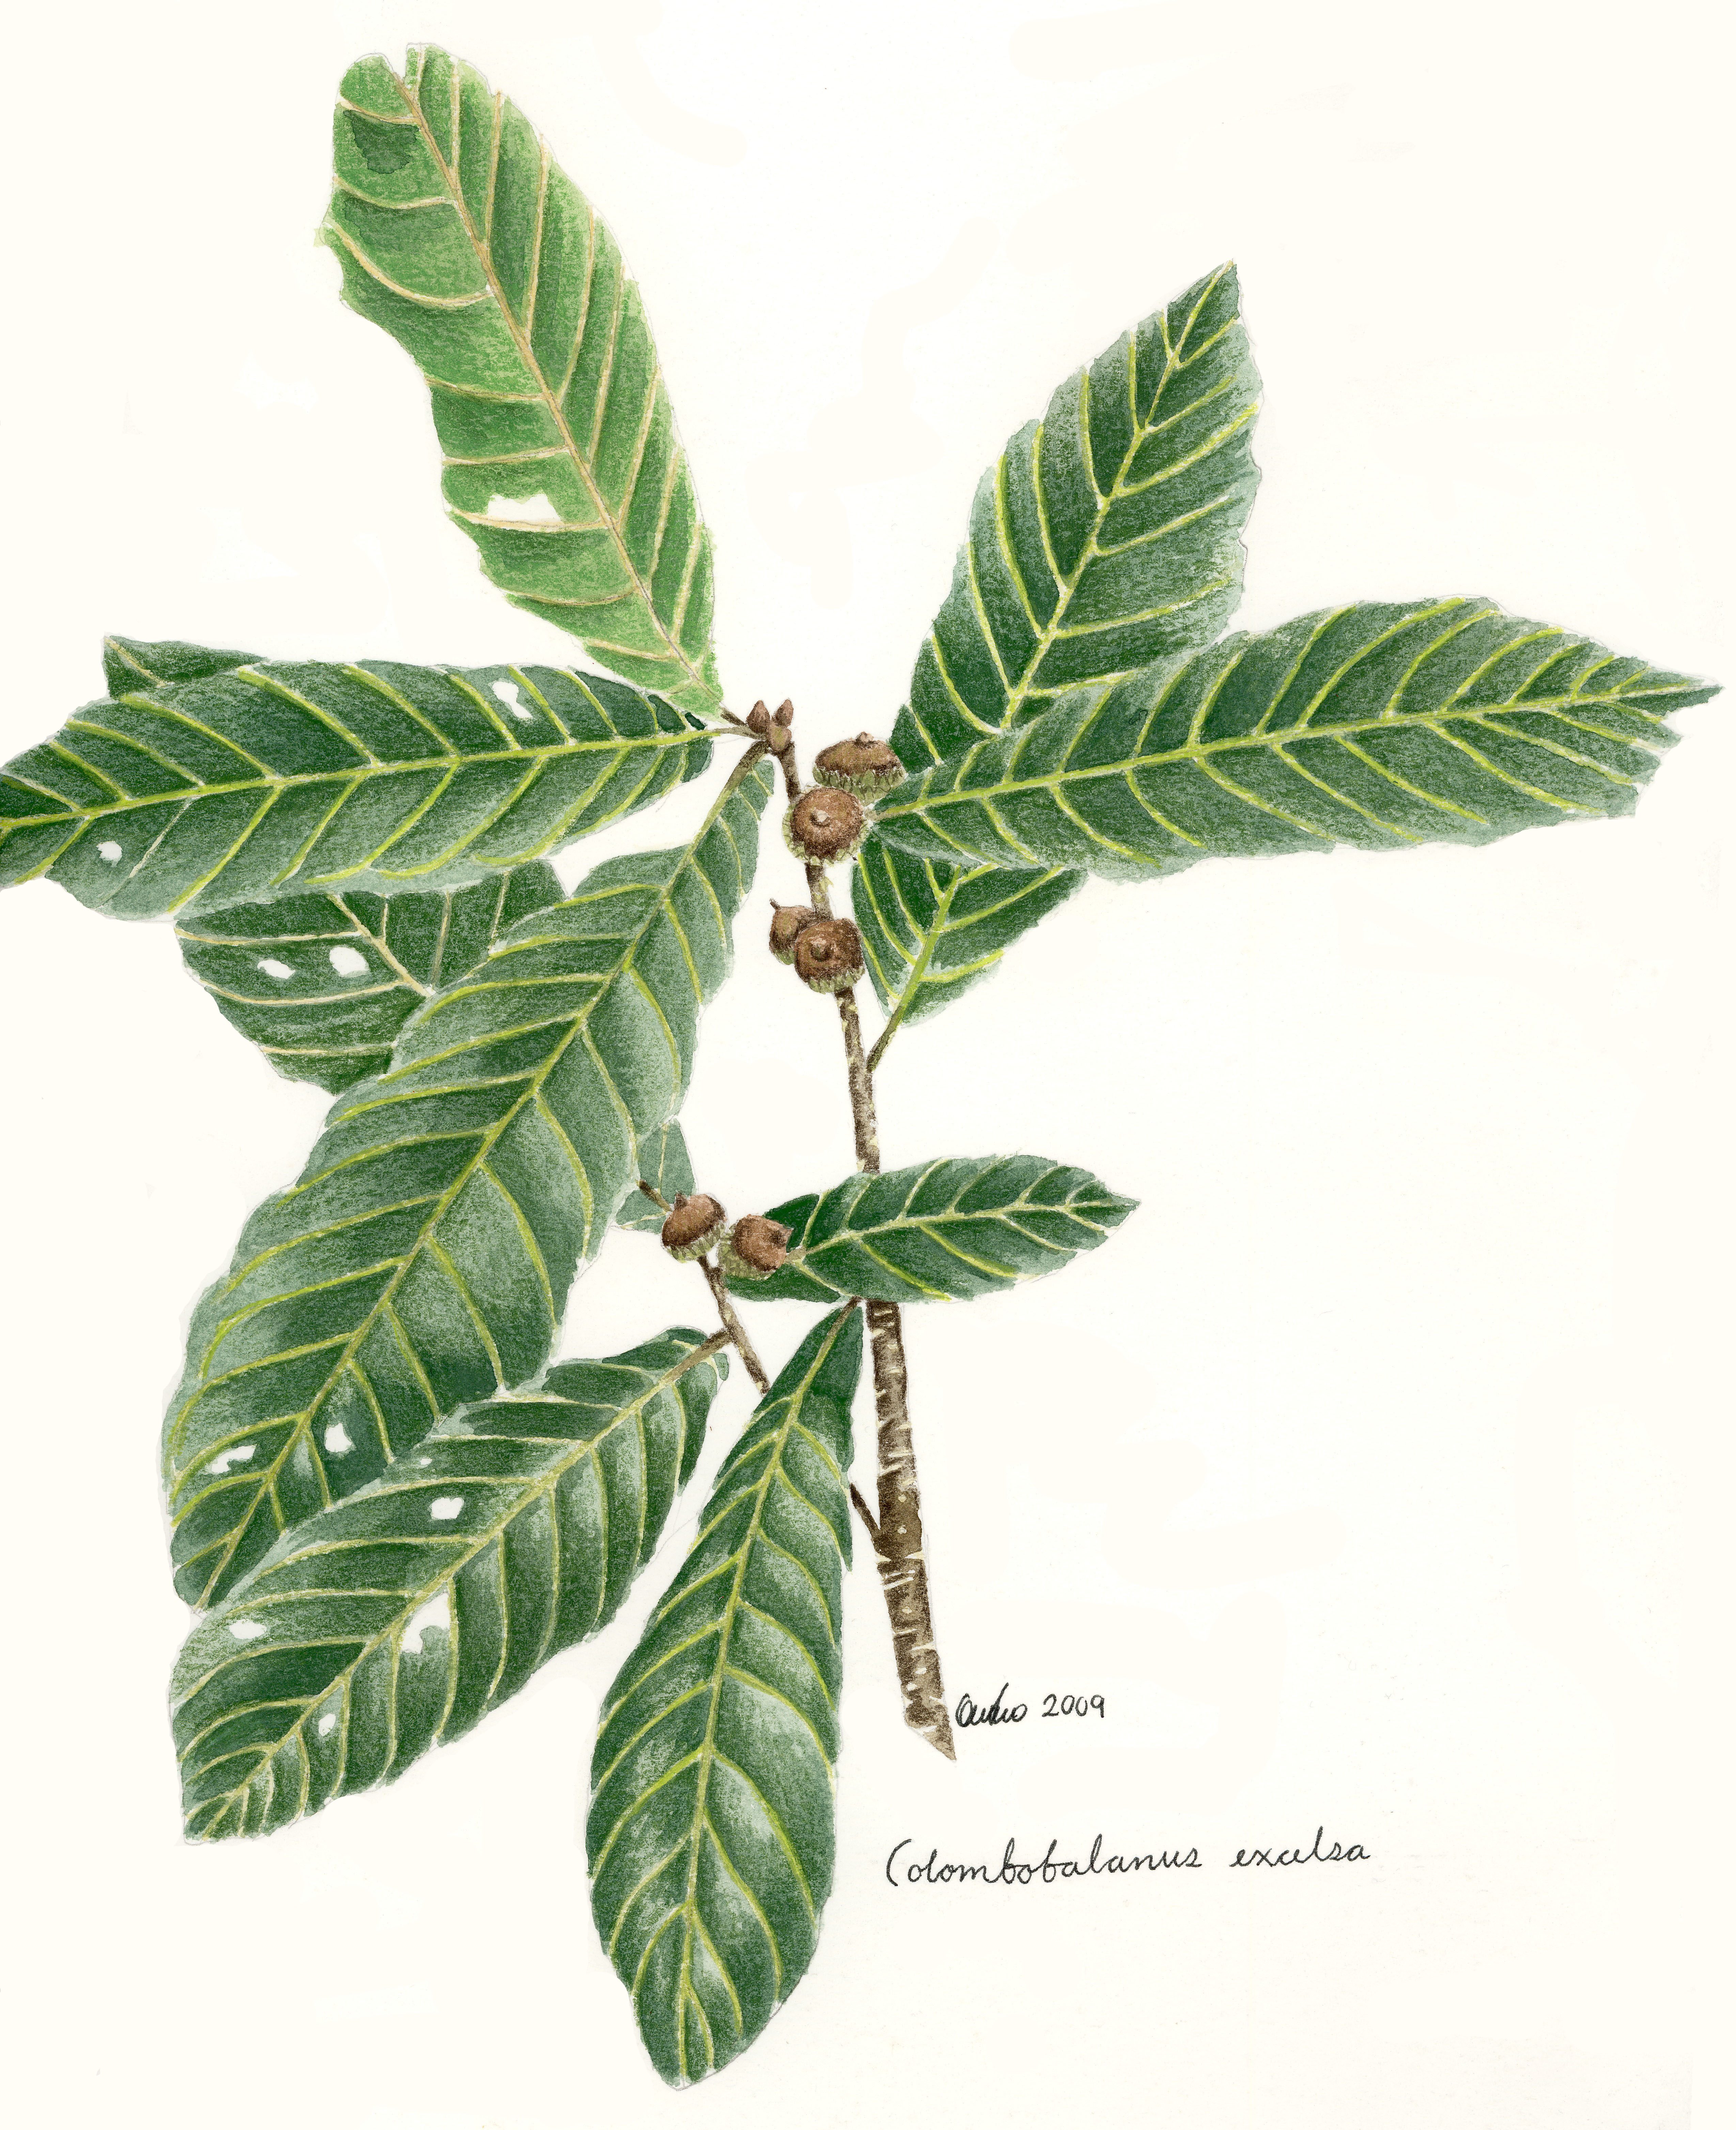 Colombobalanus excelsa